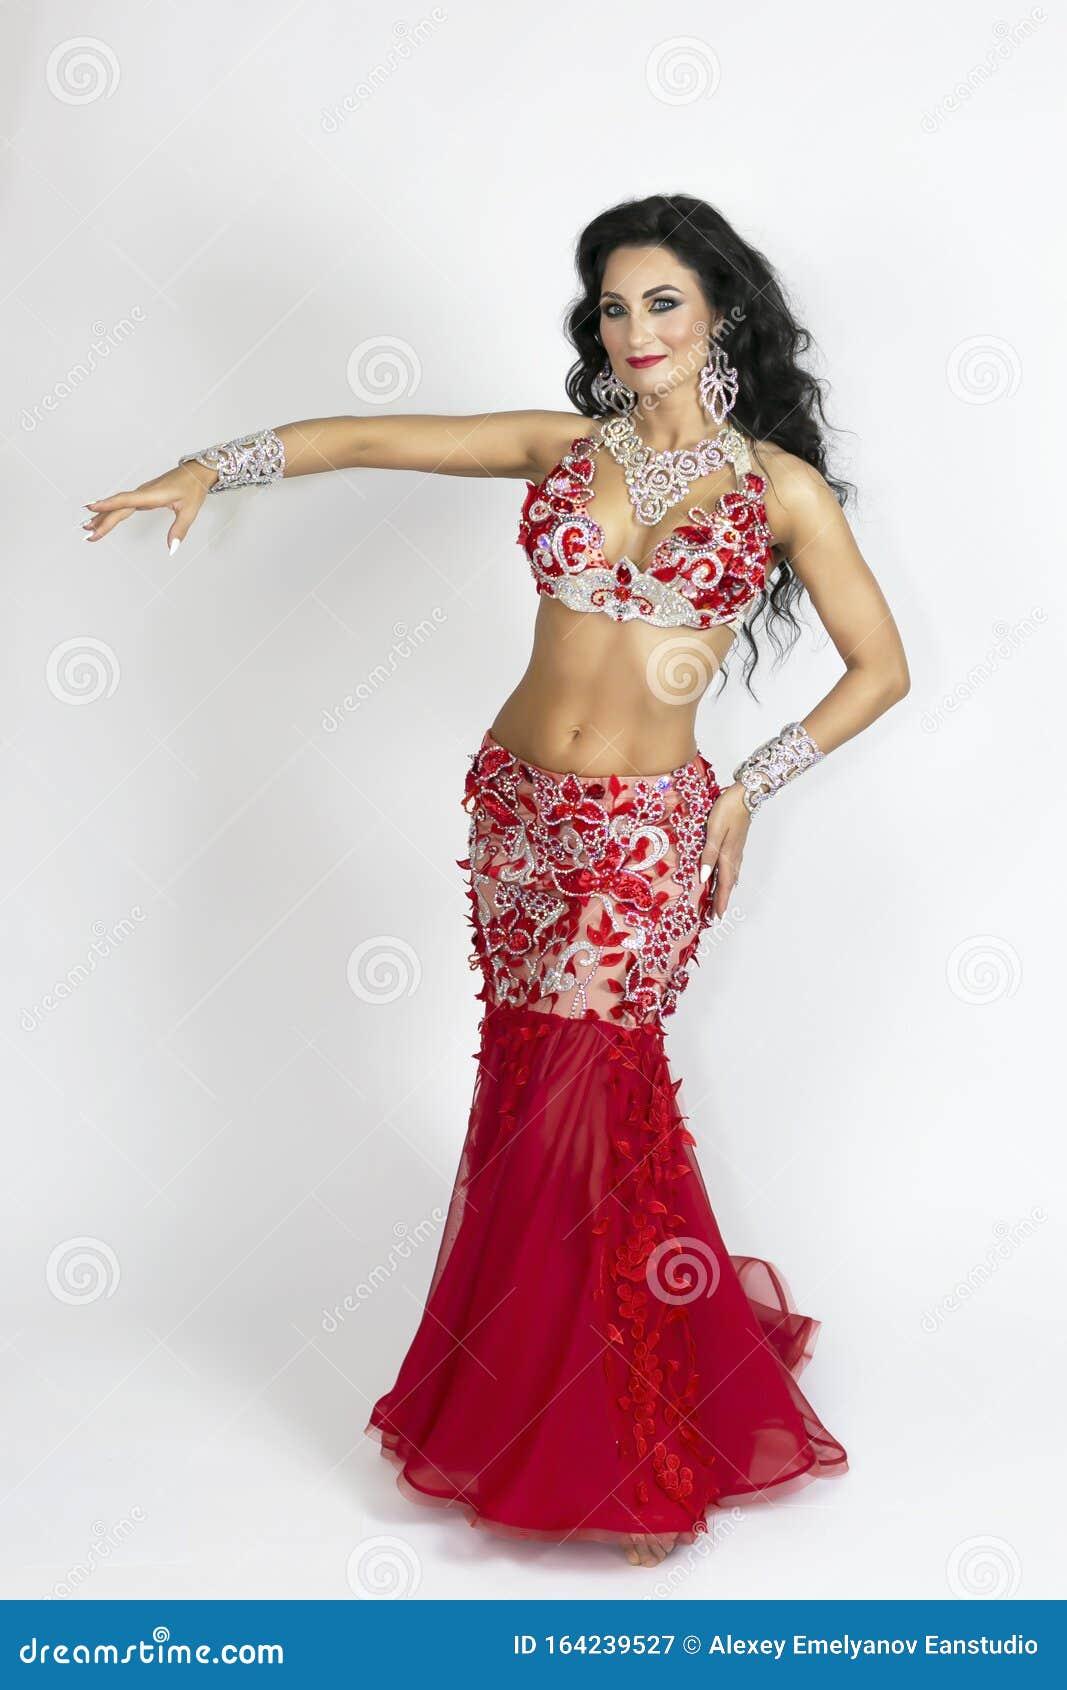 Fille En Robe Rouge Pour La Danse Orientale Image Stock Image Du Orientale Fille 164239527